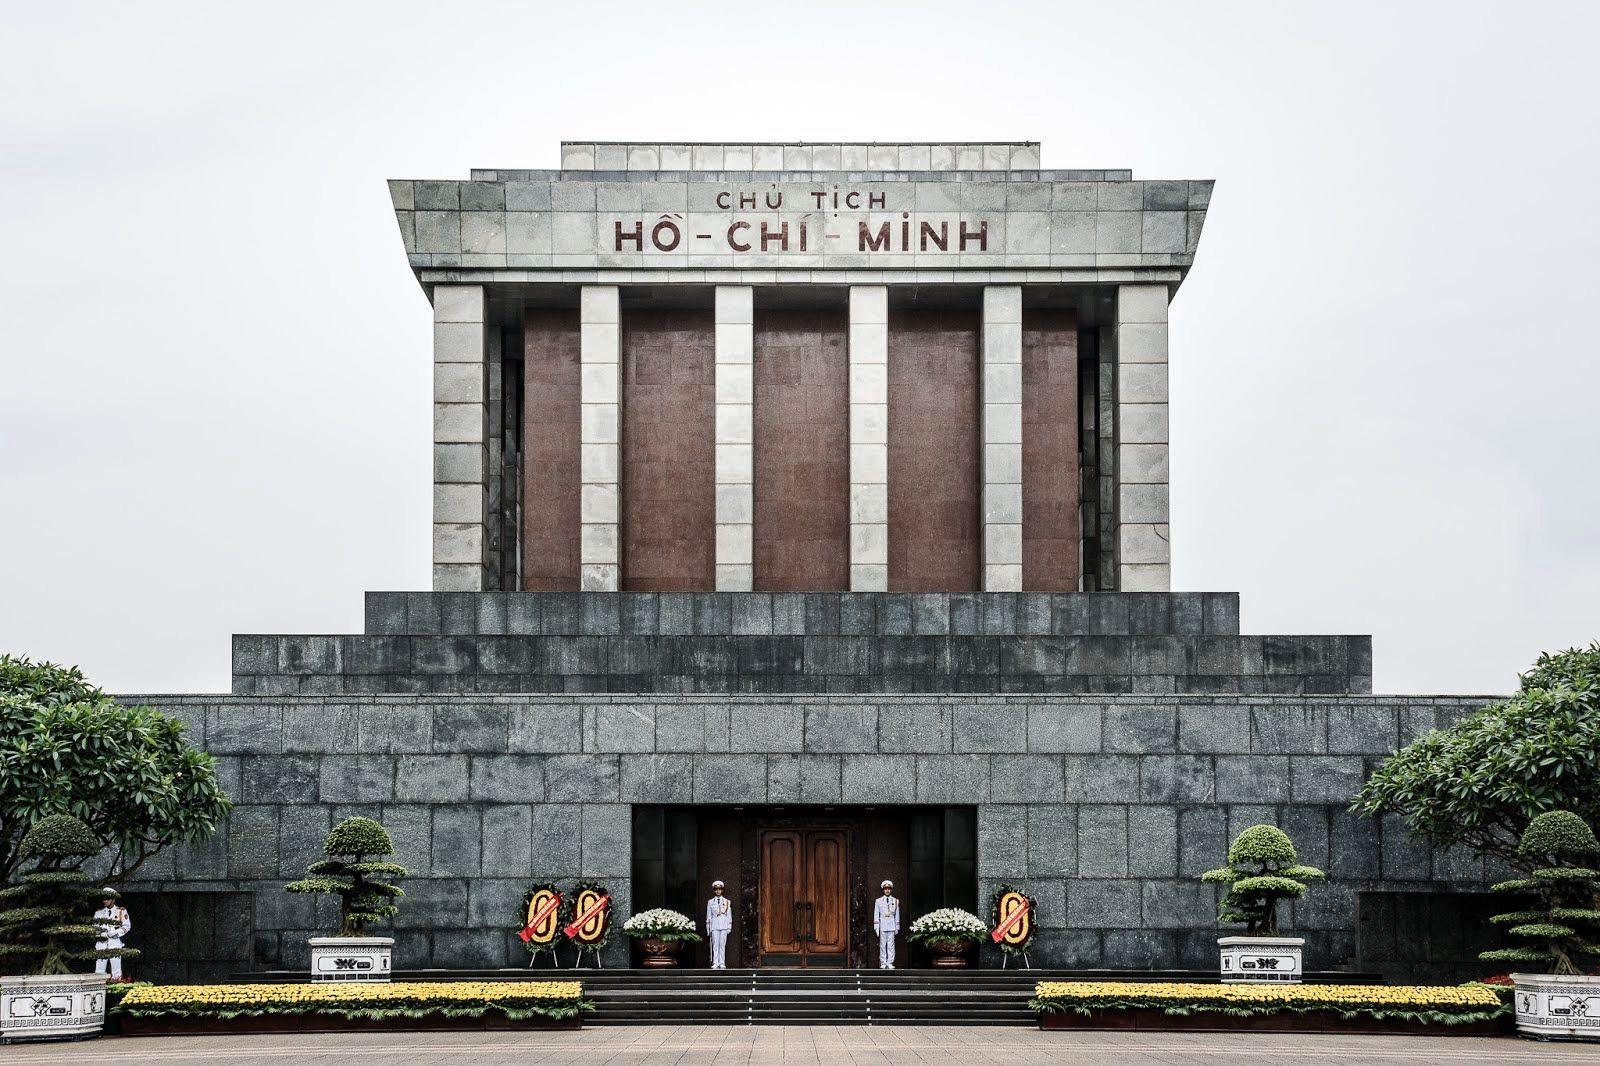 4. Ho Chi Minh Mausoleum